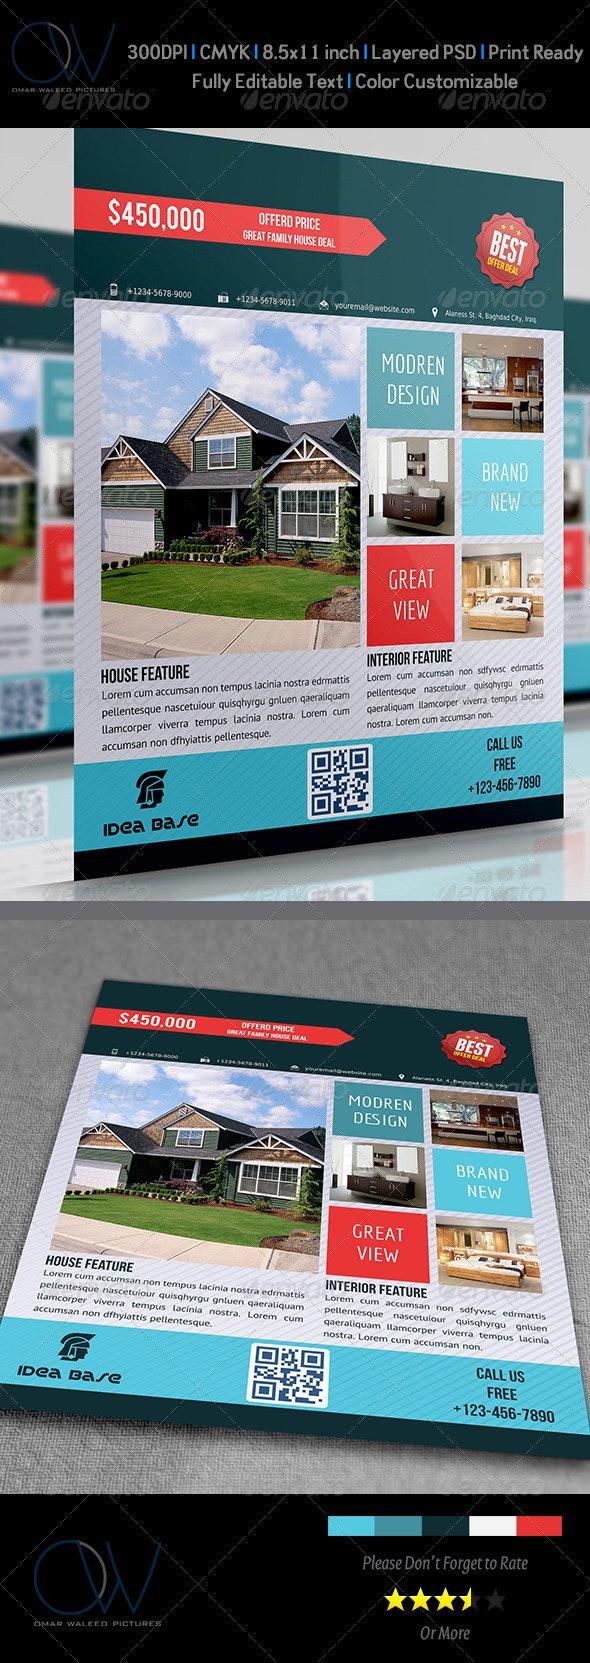 Real Estate Flyer Vol.2 - Commerce Flyers